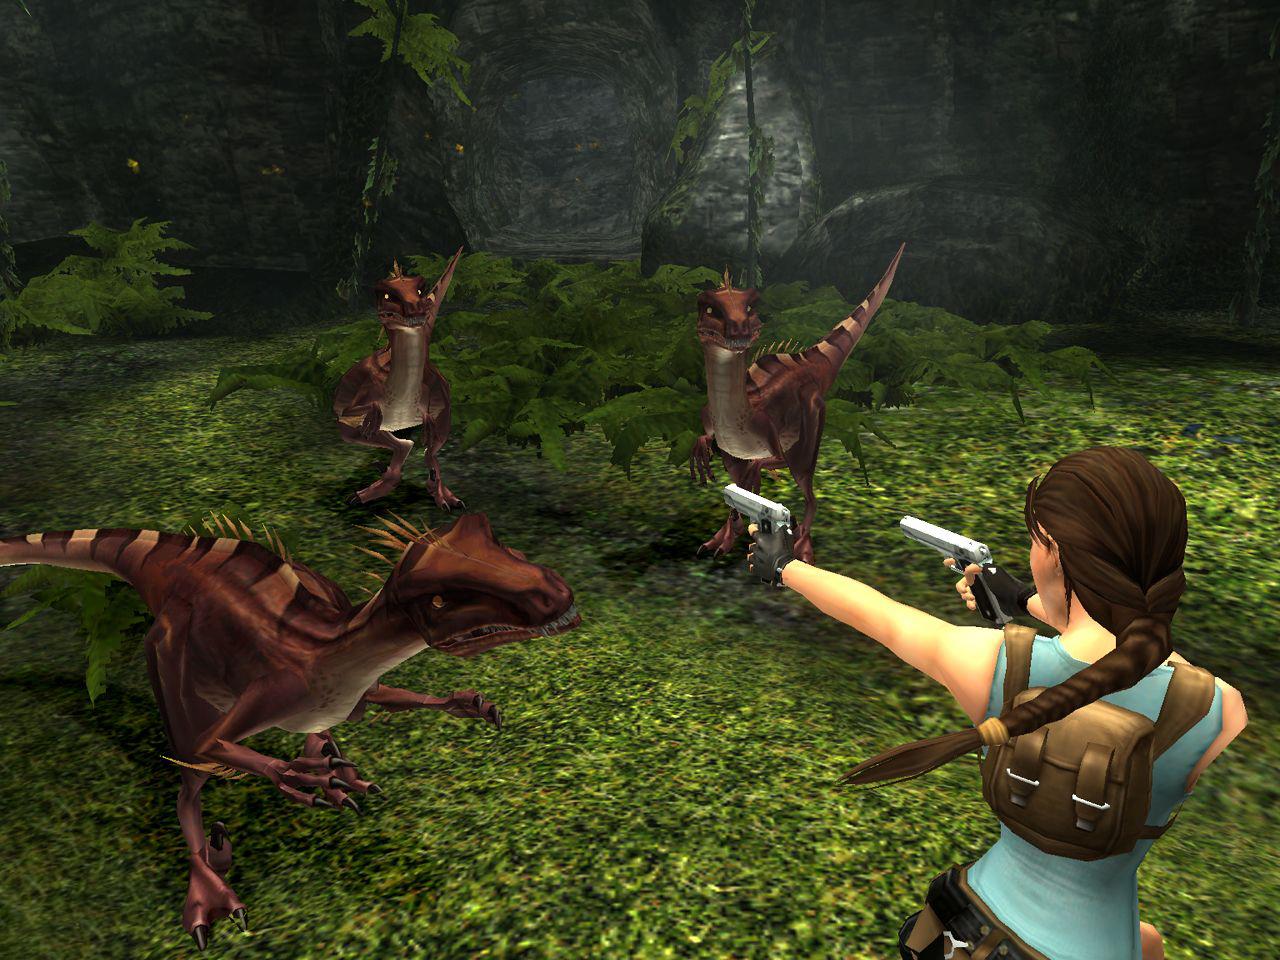 File:Lara-croft-tomb-raider-anniversary.jpg